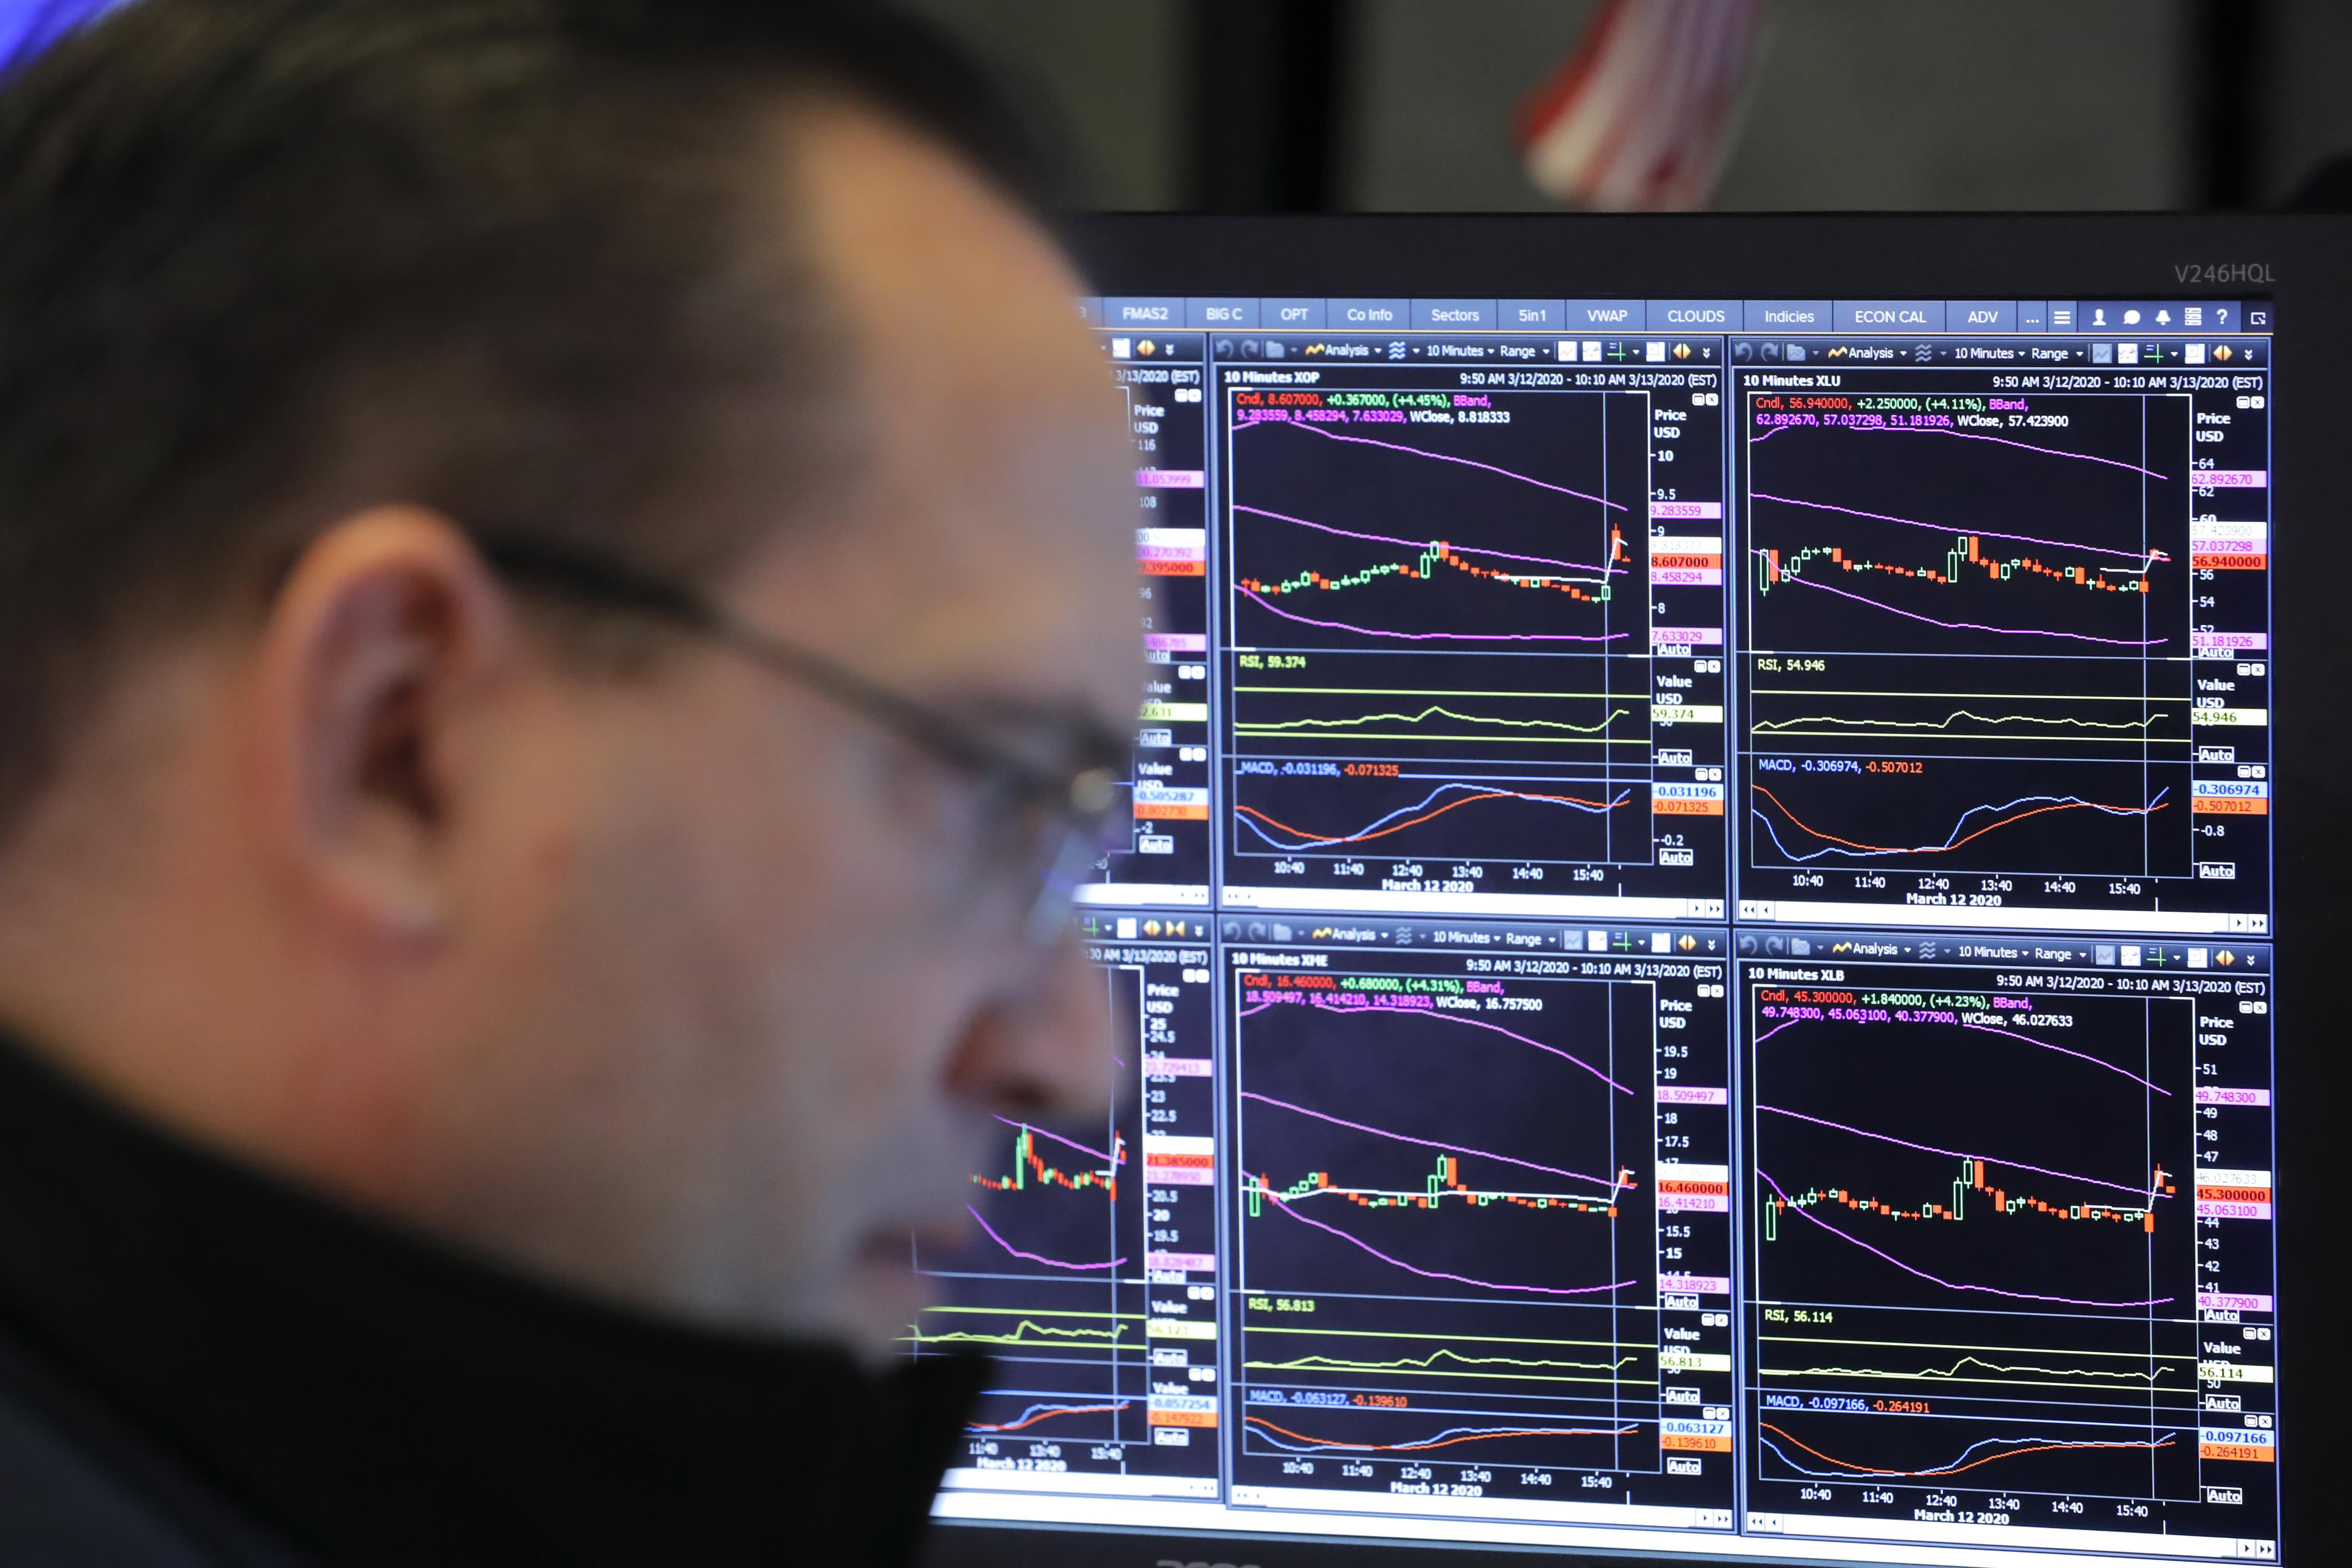 Stock futures rise, extending rebound from coronavirus sell-off